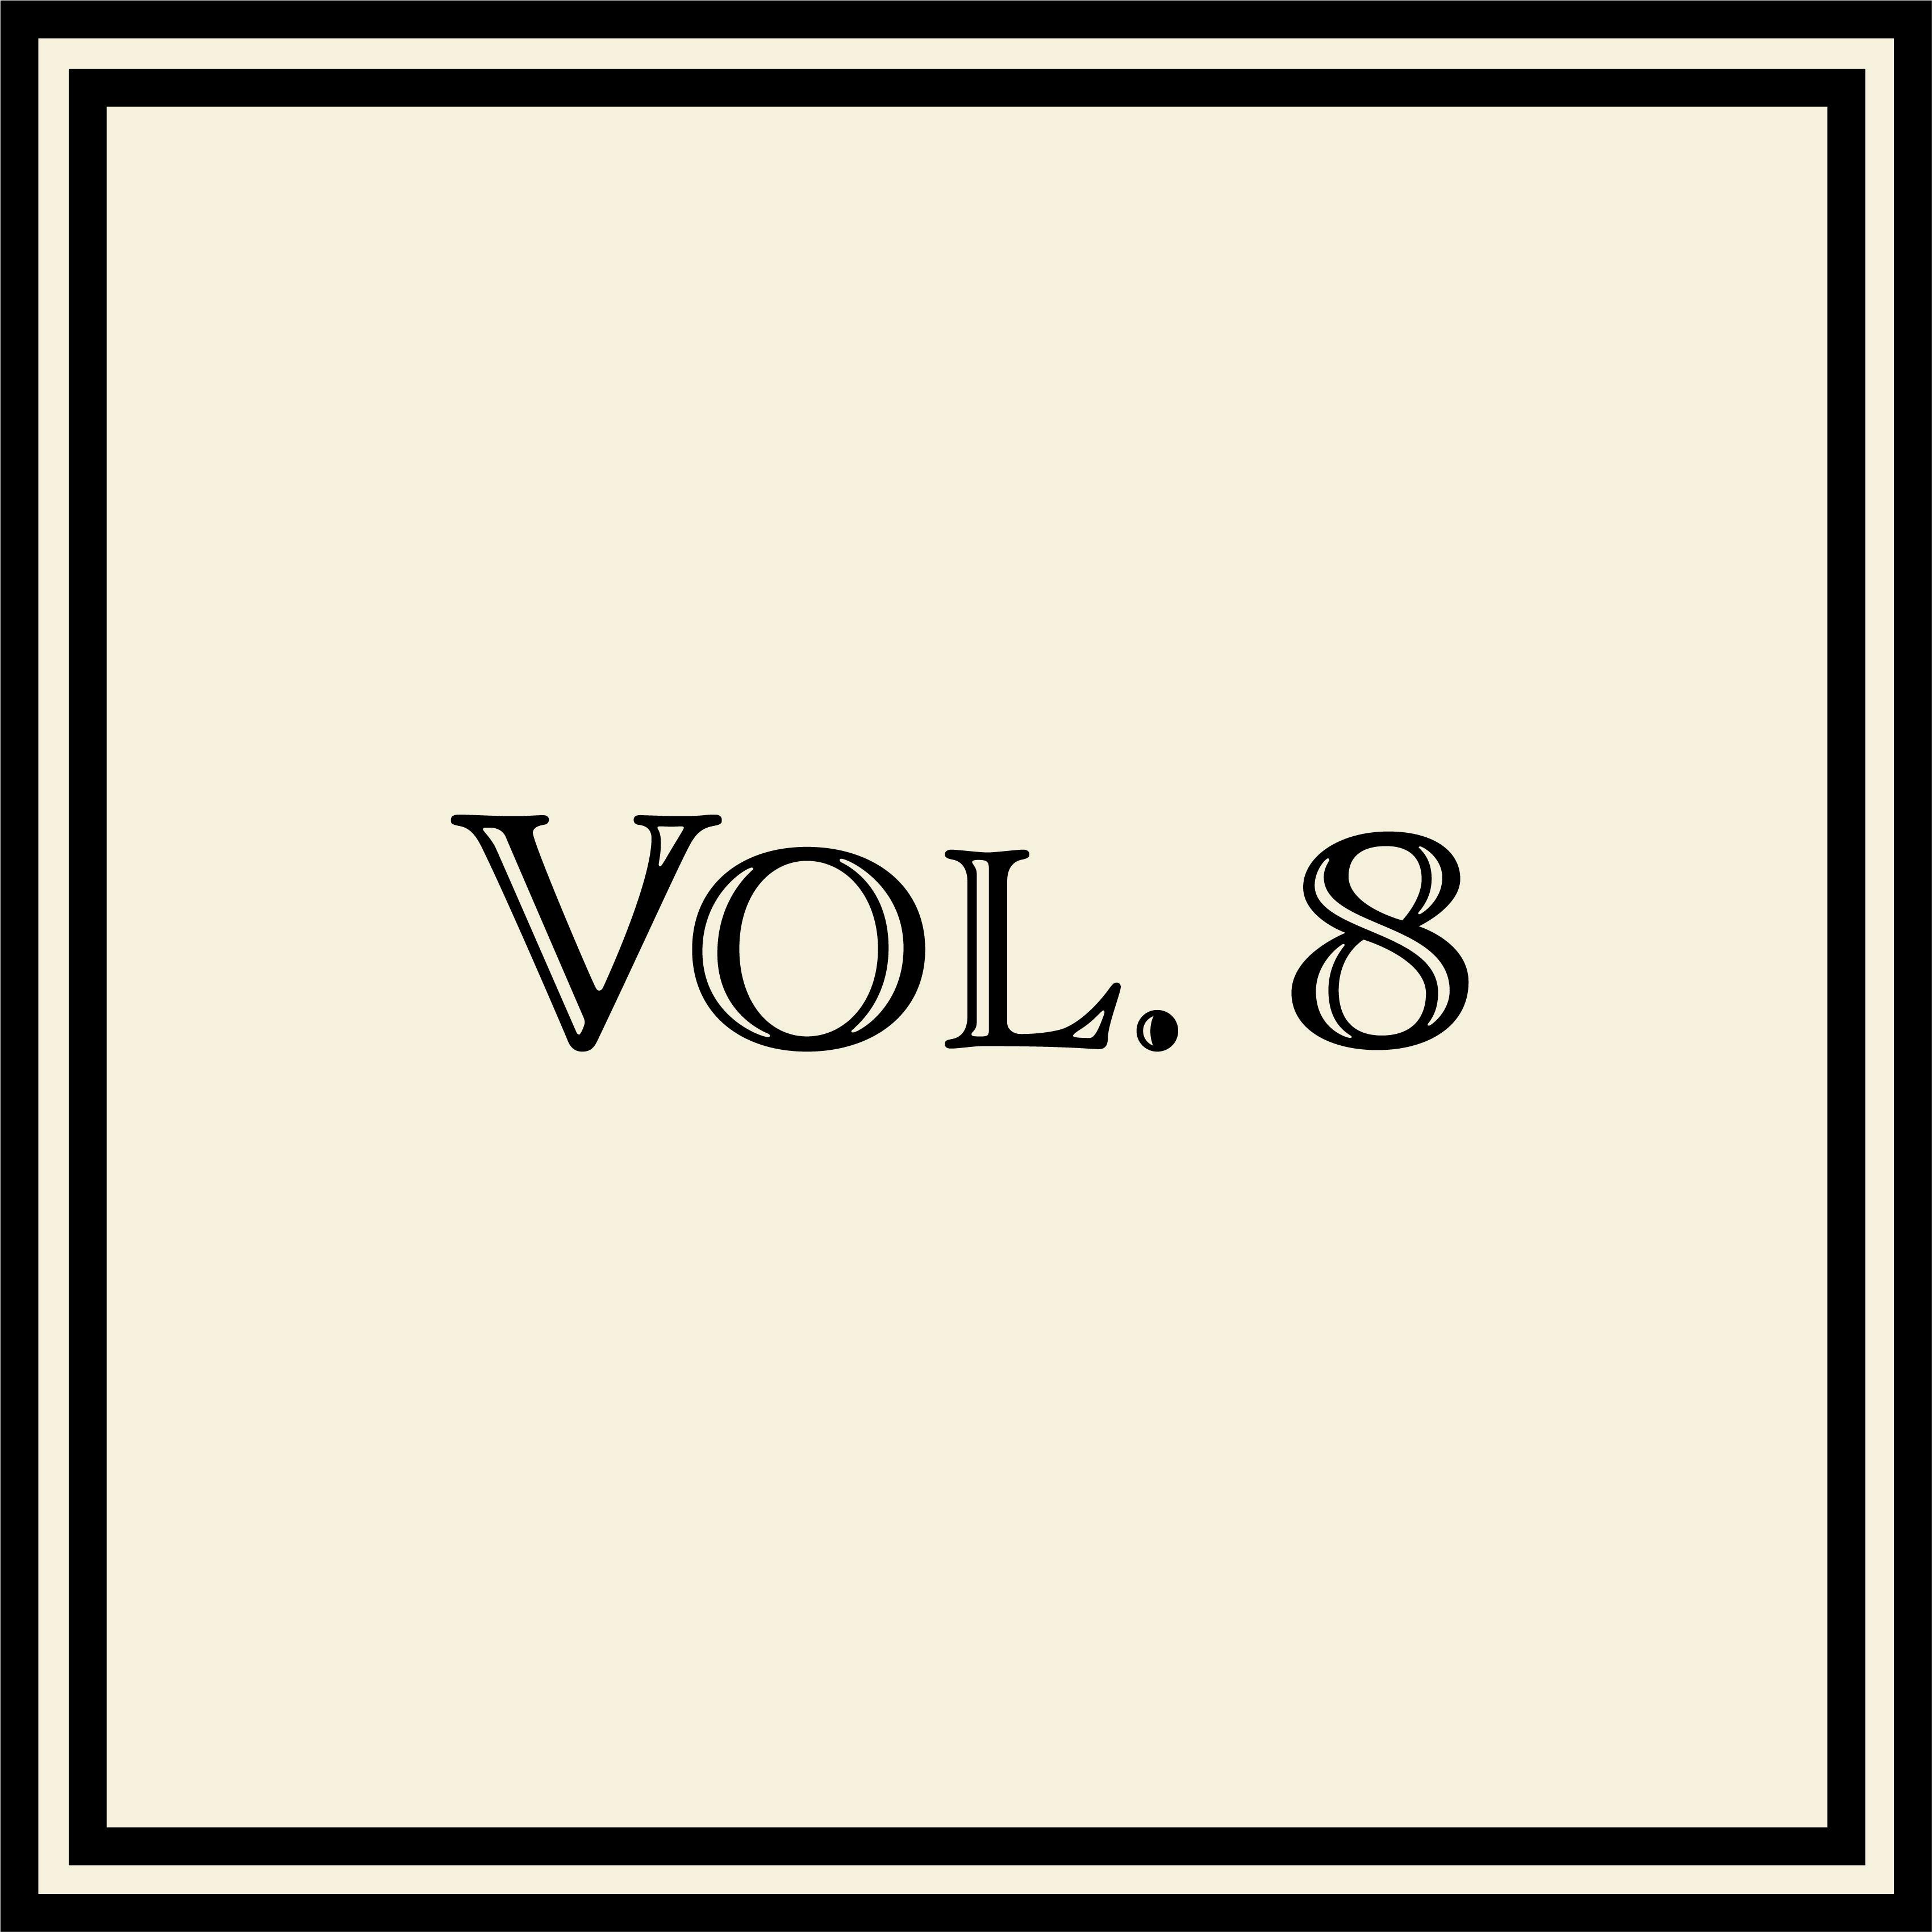 volume8